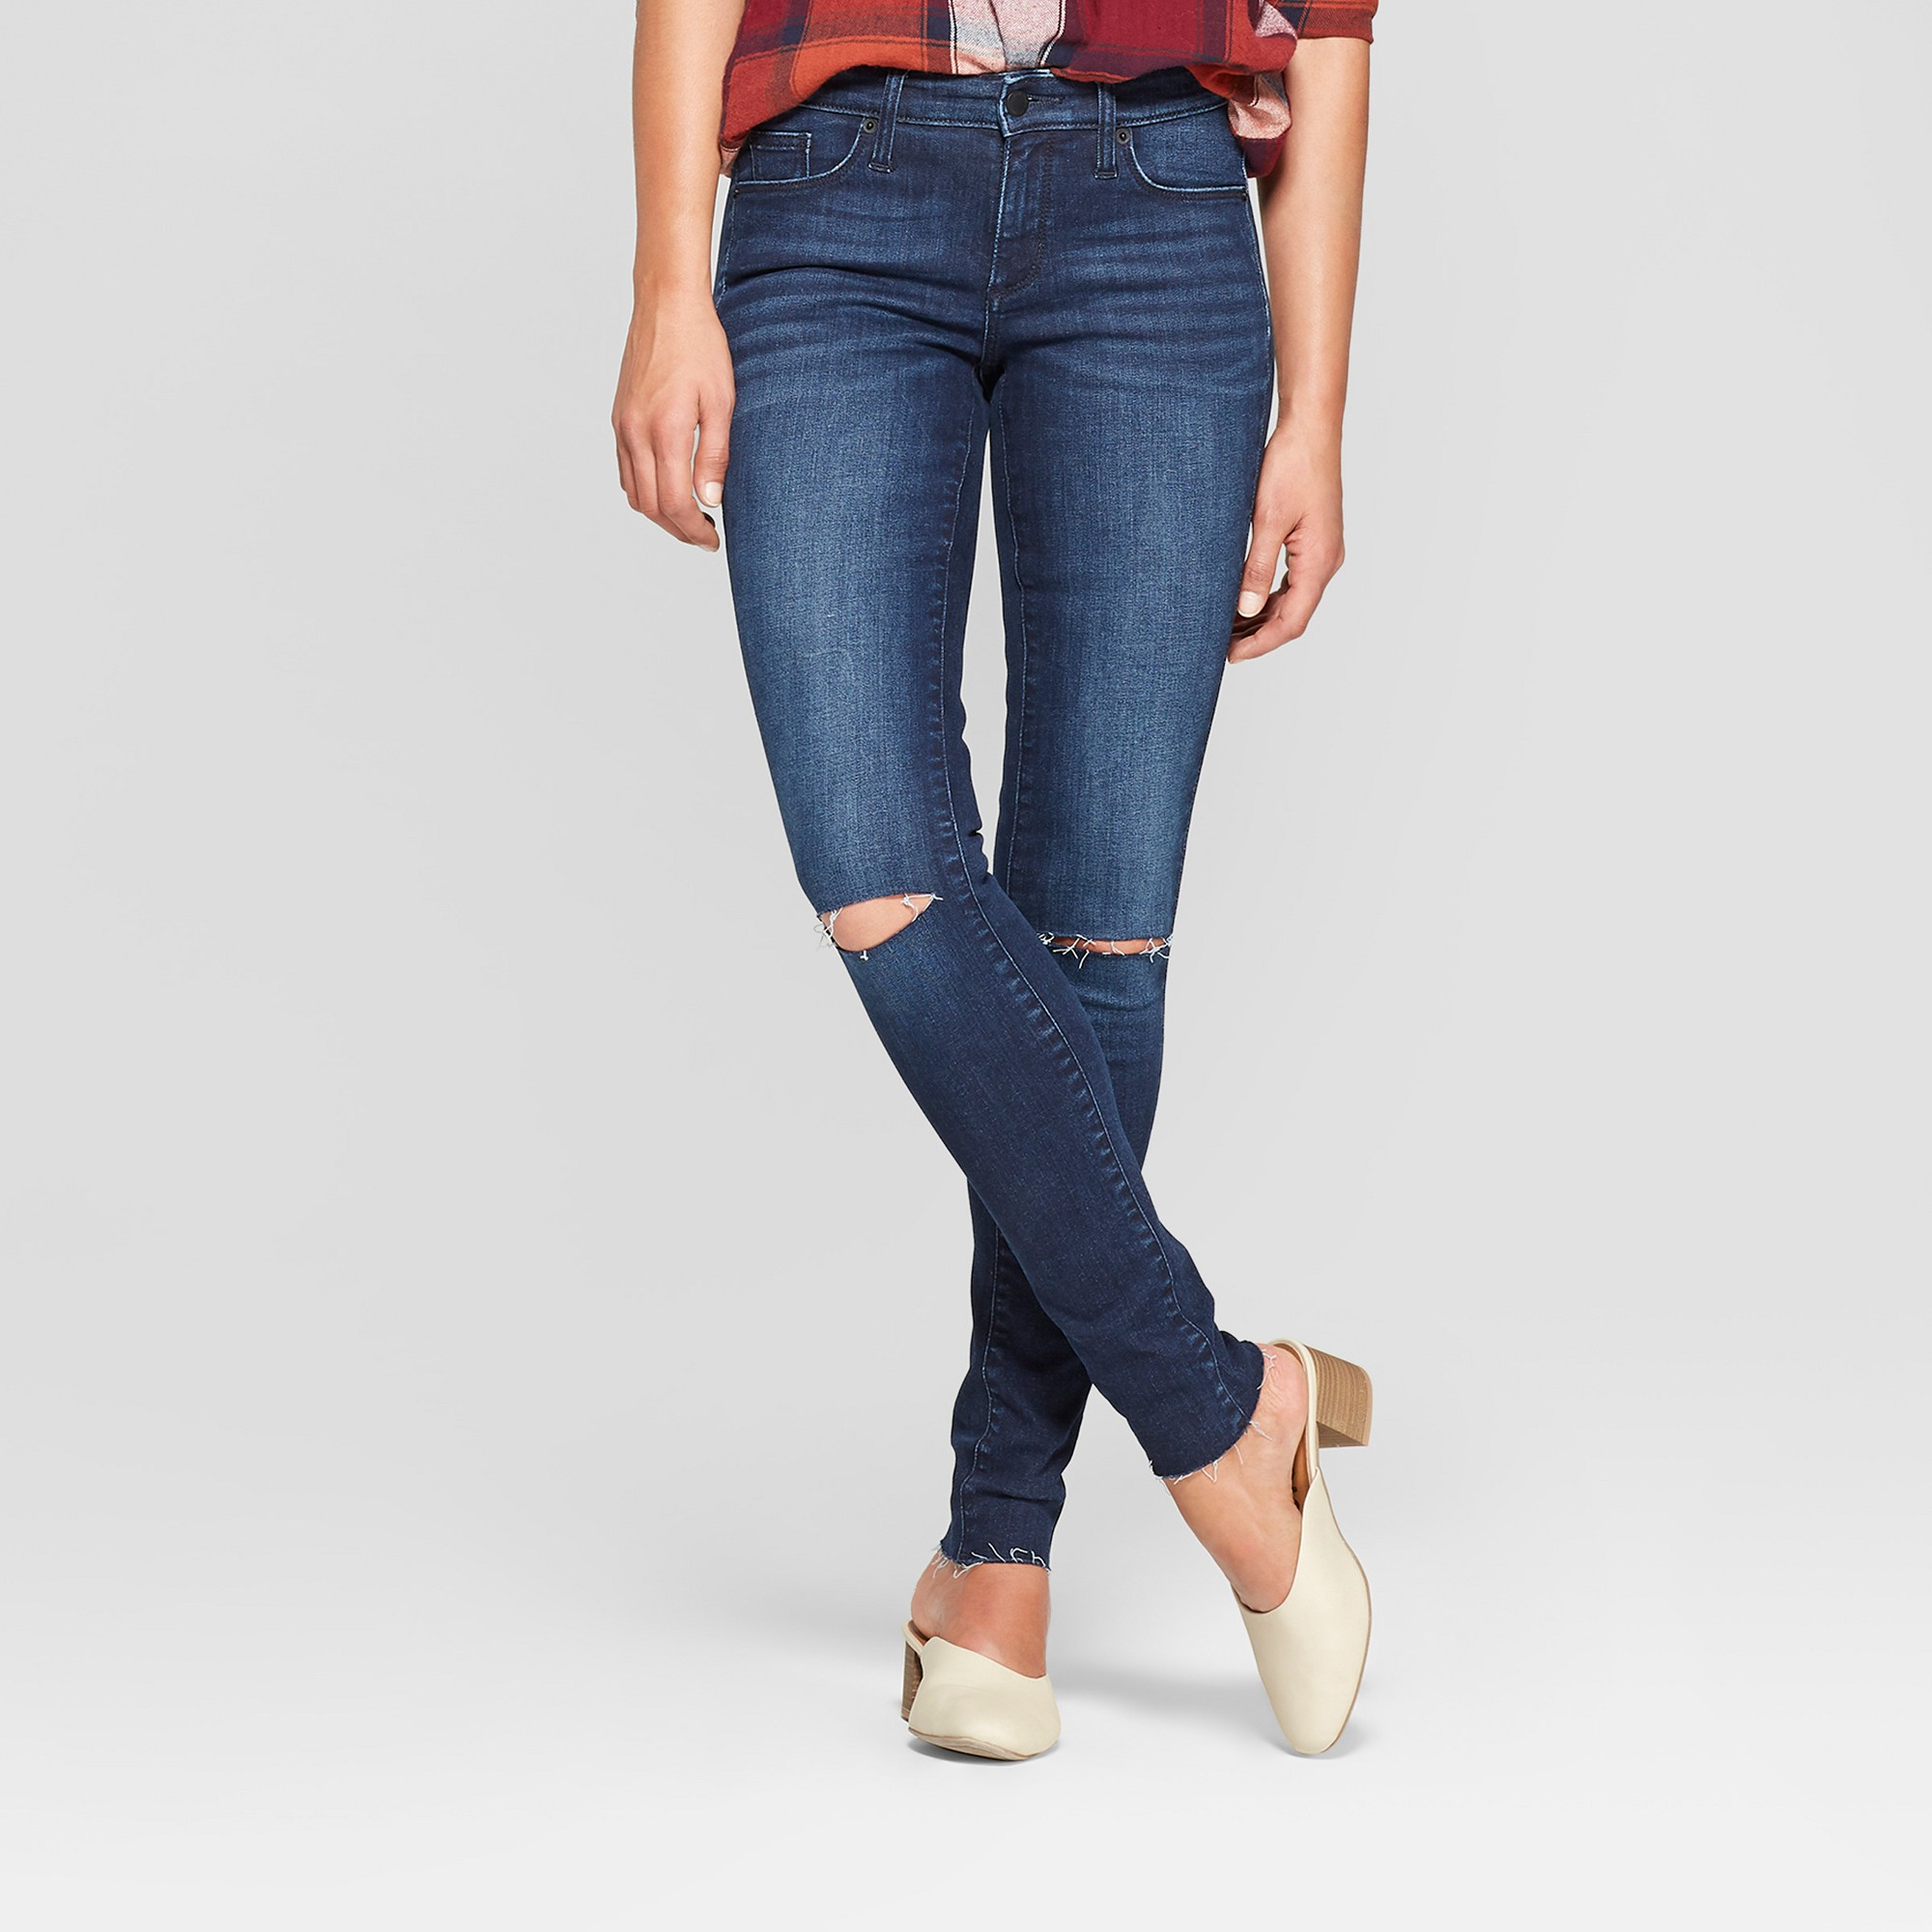 Women's Mid-Rise Slit Knee Distressed Skinny Jeans - Universal Thread Dark Wash 8, Blue